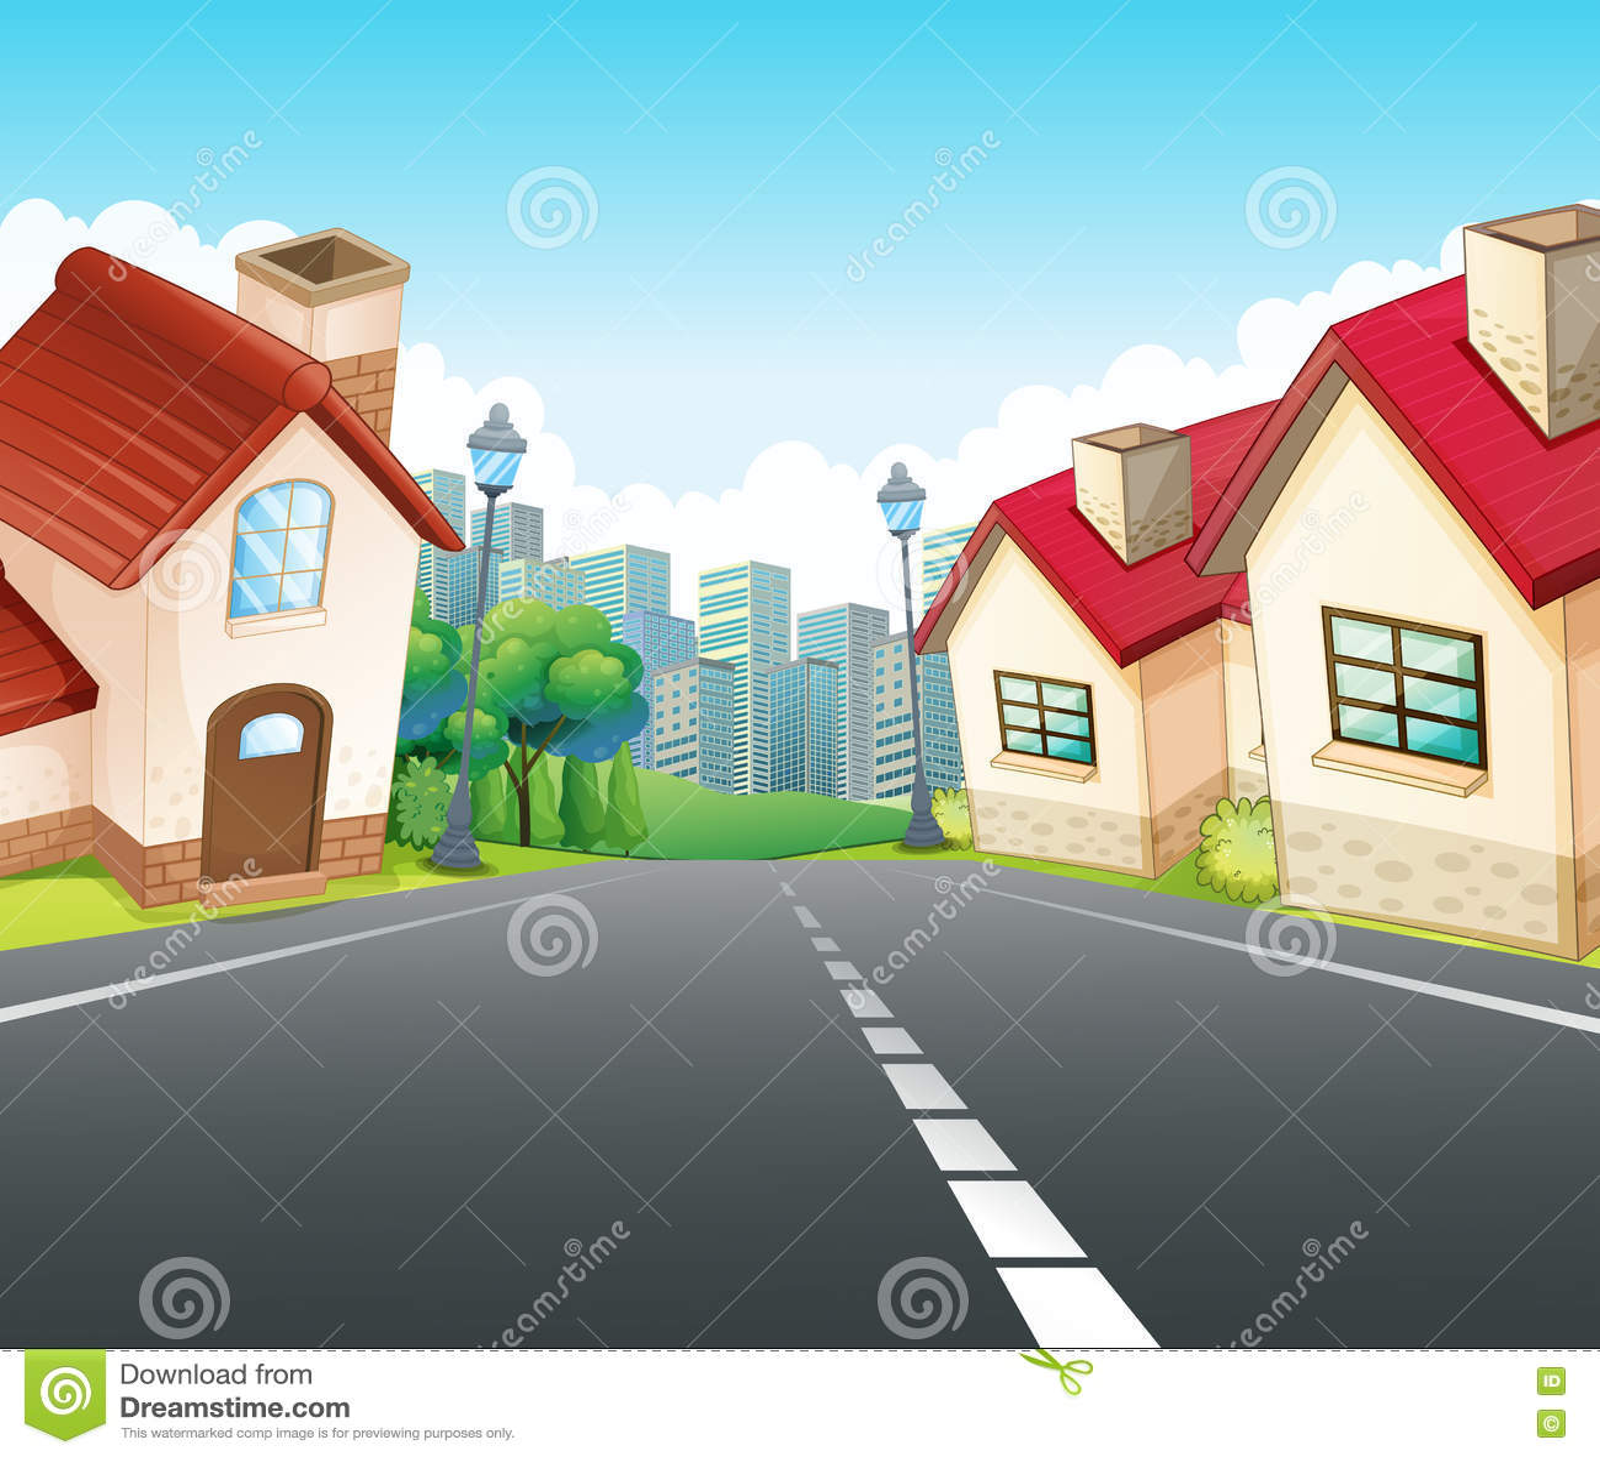 Neighborhood Scene With Many Houses Along The Road Stock